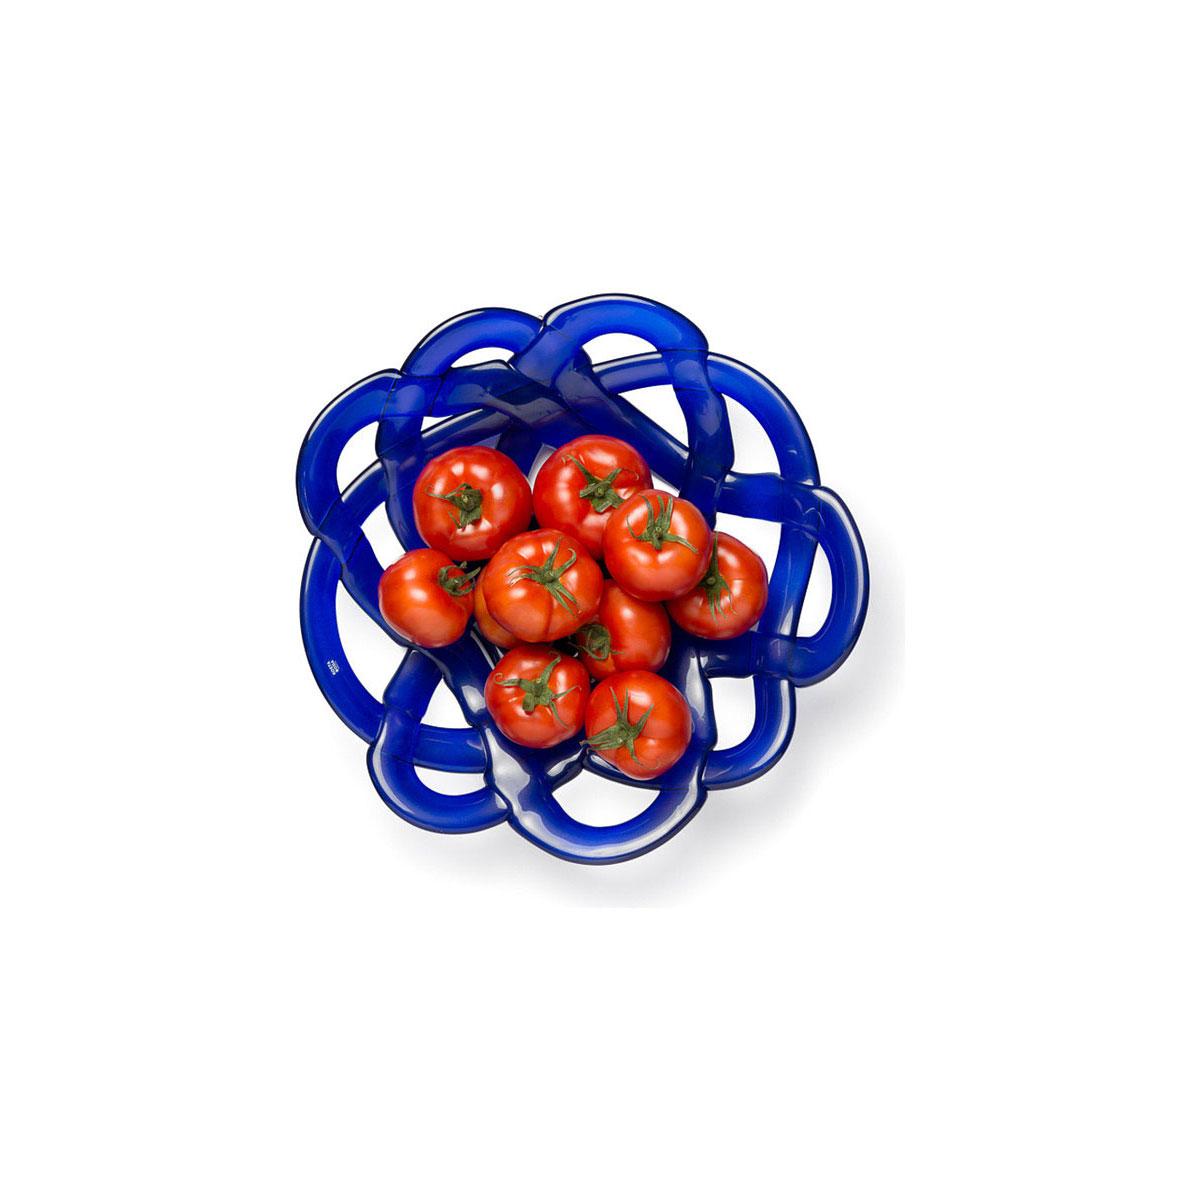 Kosta Boda Small Basket, Blue